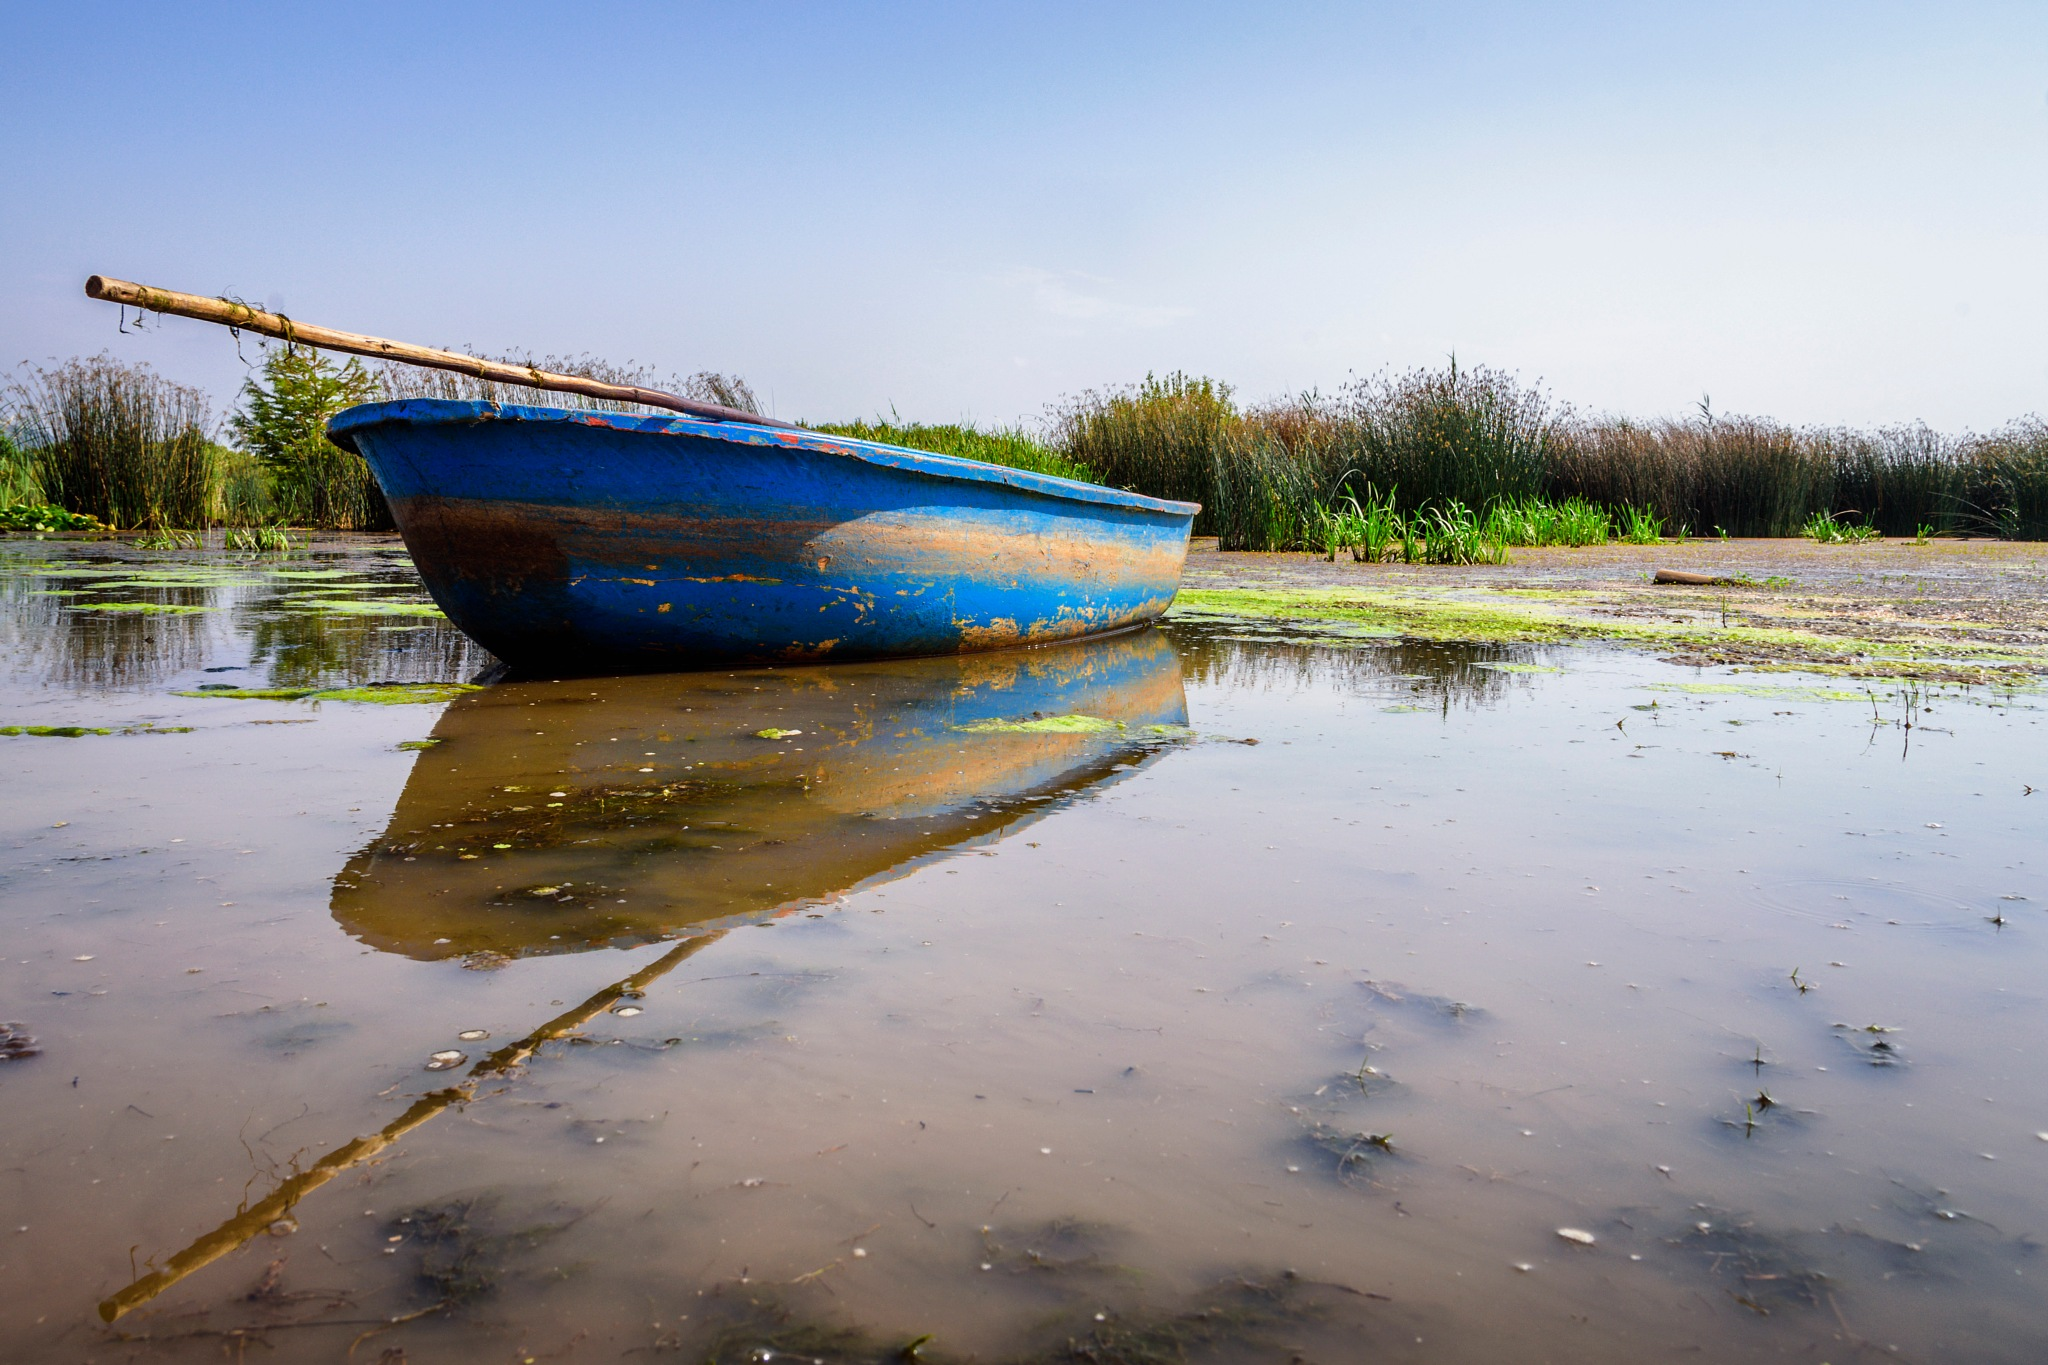 Blue boat by Noureddine Belfethi